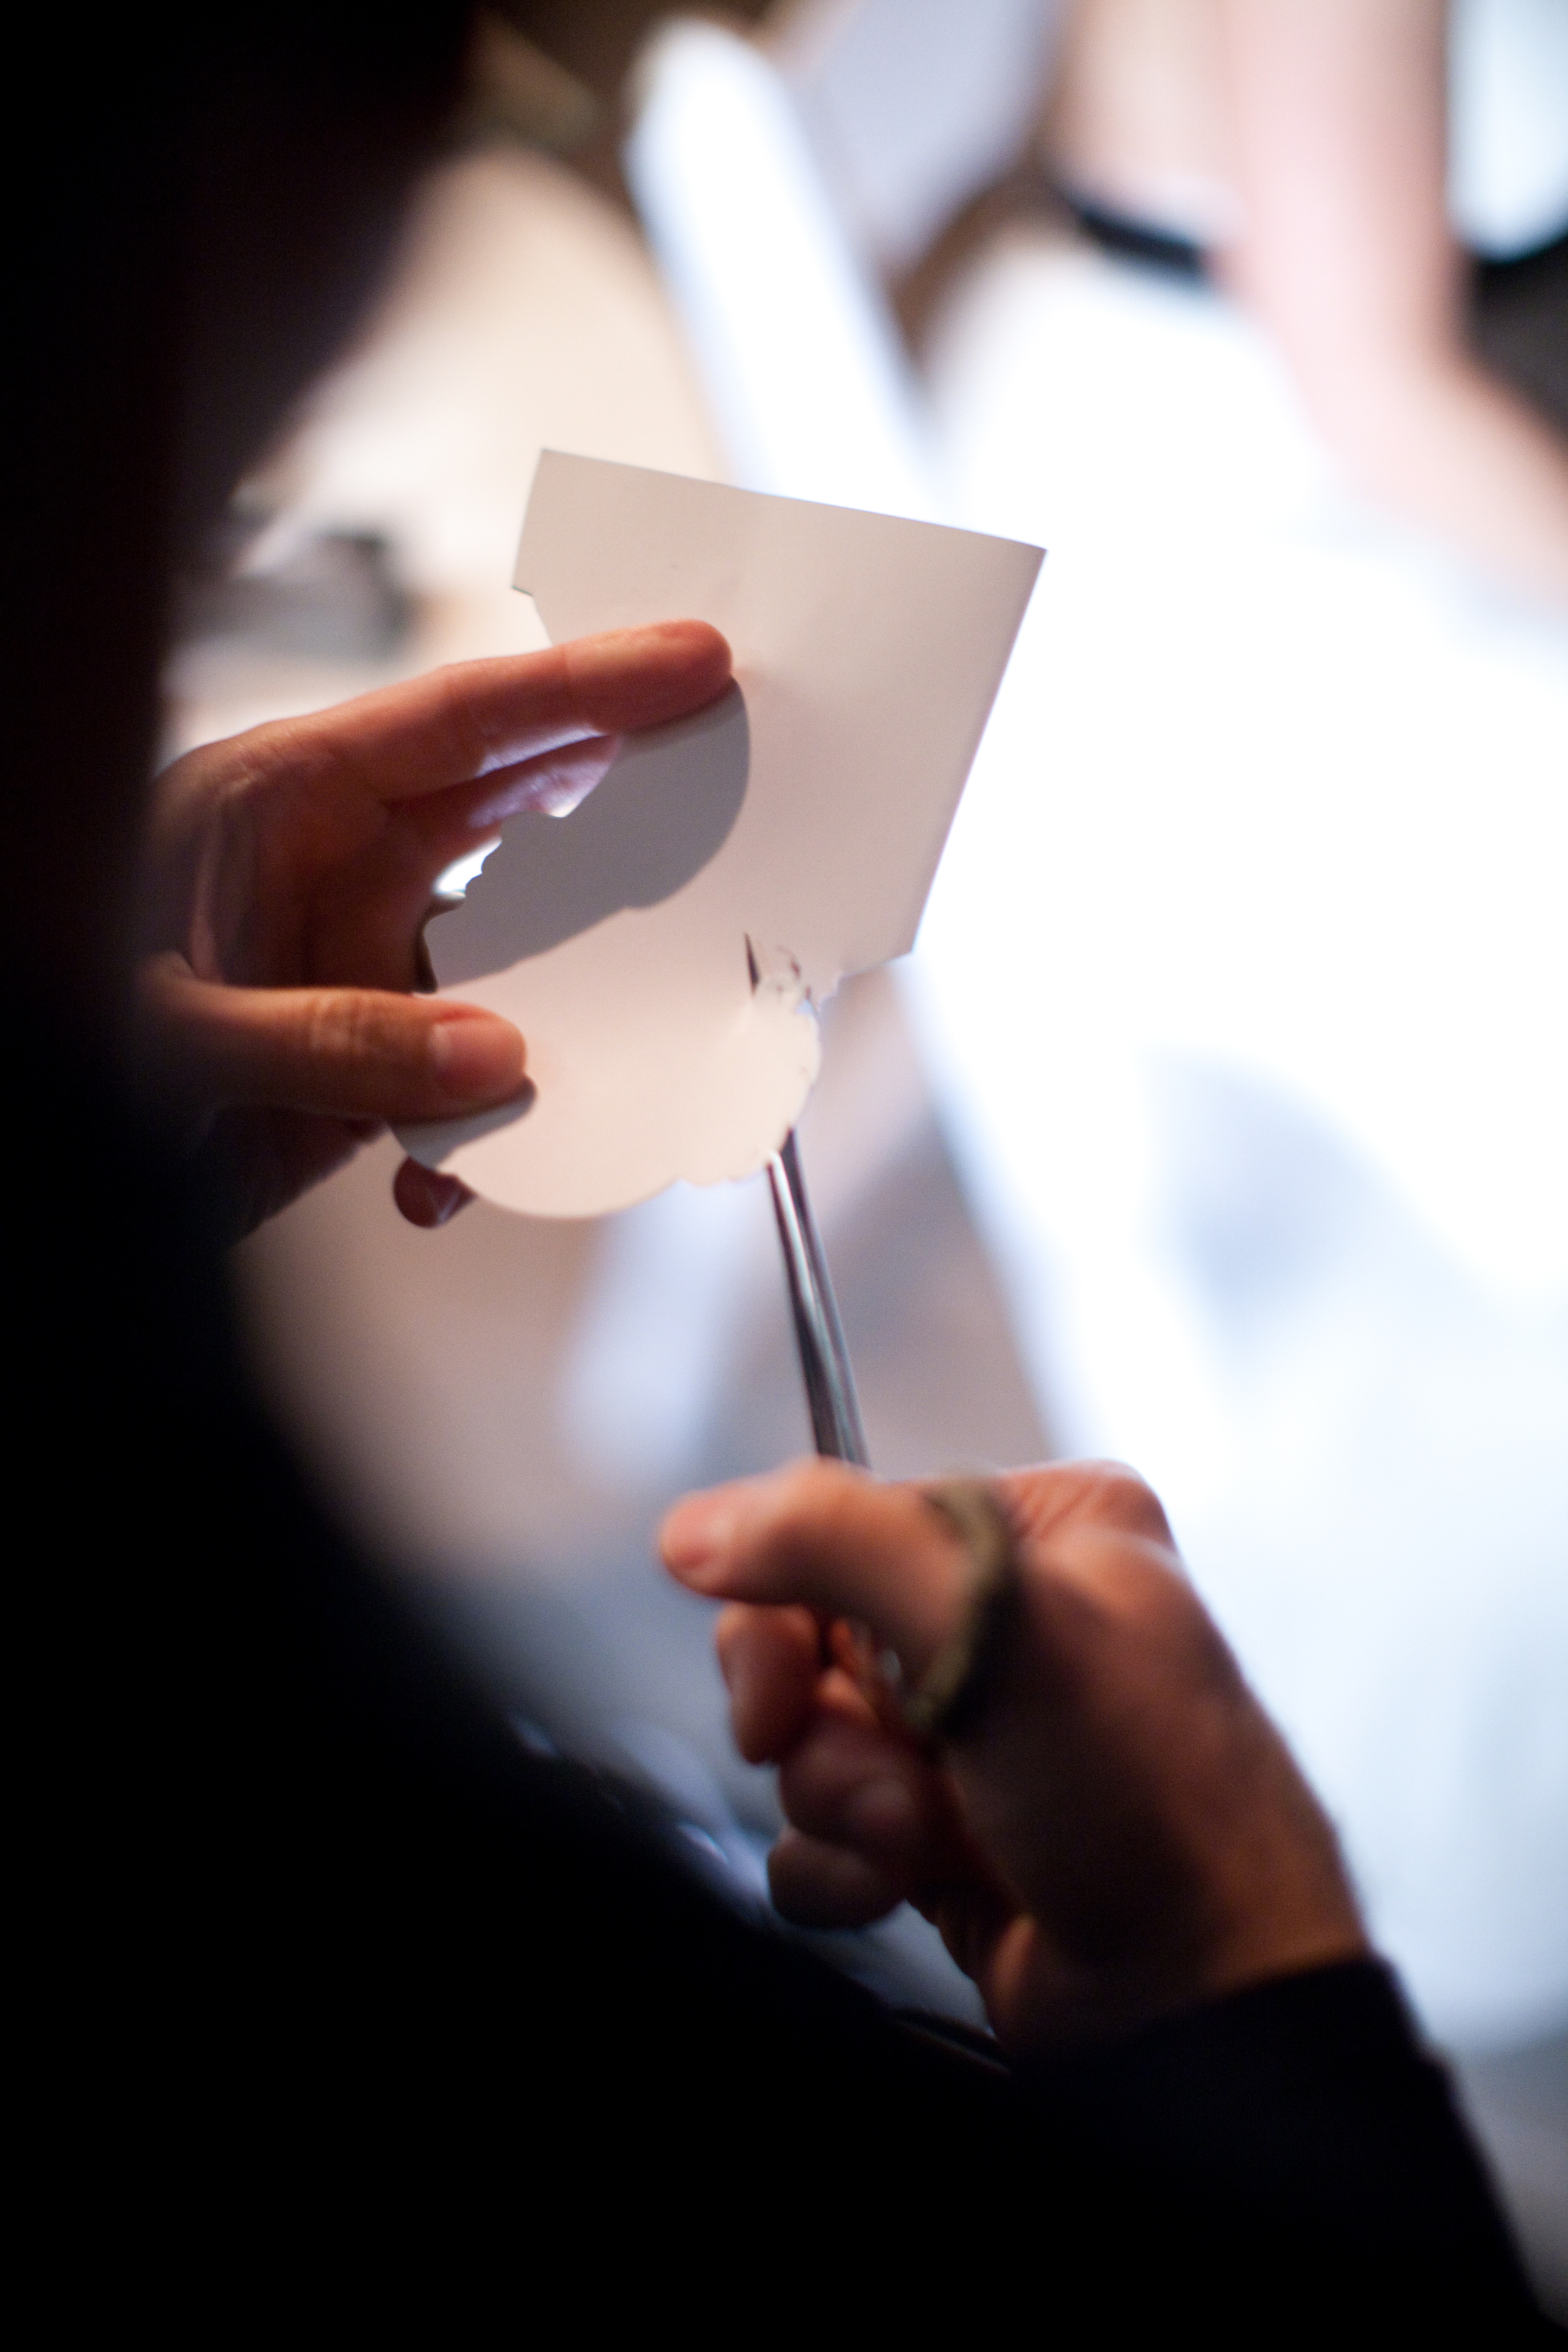 Karl's hands cutting Samantha Hanks silhouette at wedding..jpg